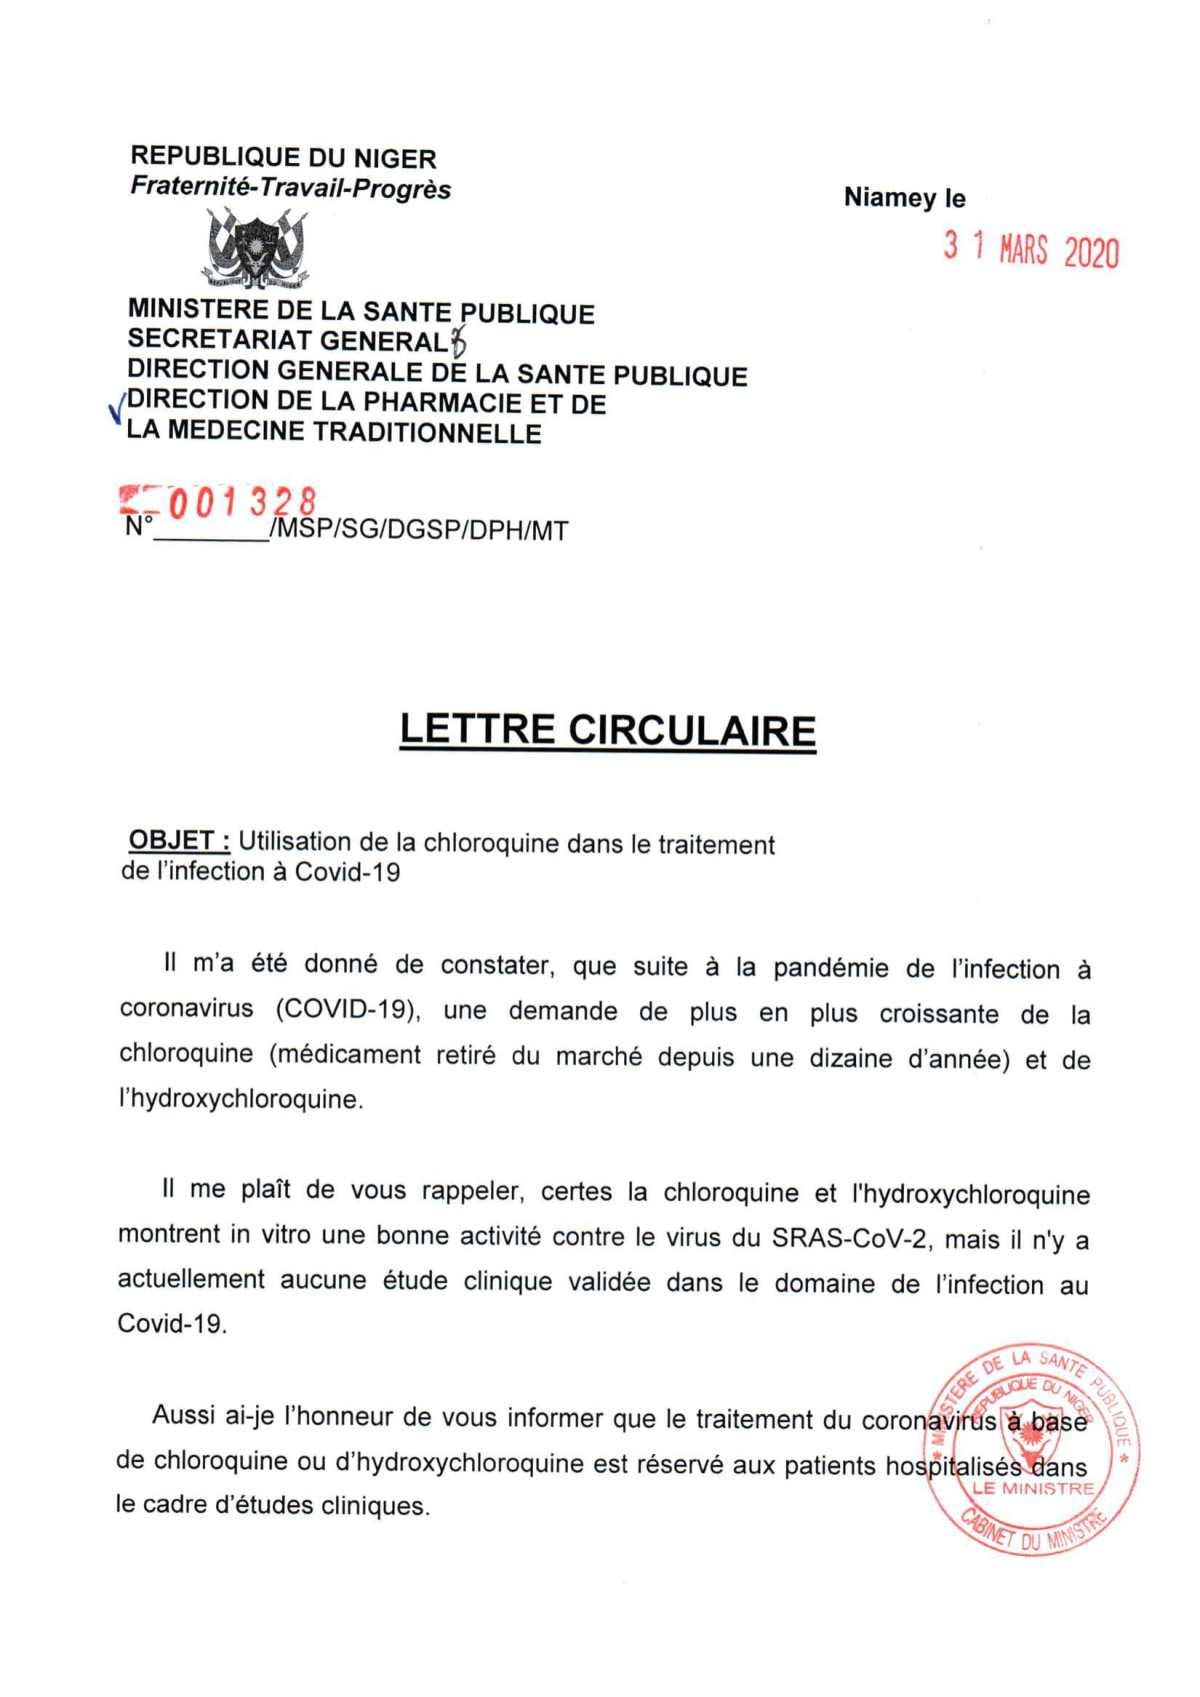 La lettre circulaire du Niger contre le coronavirus